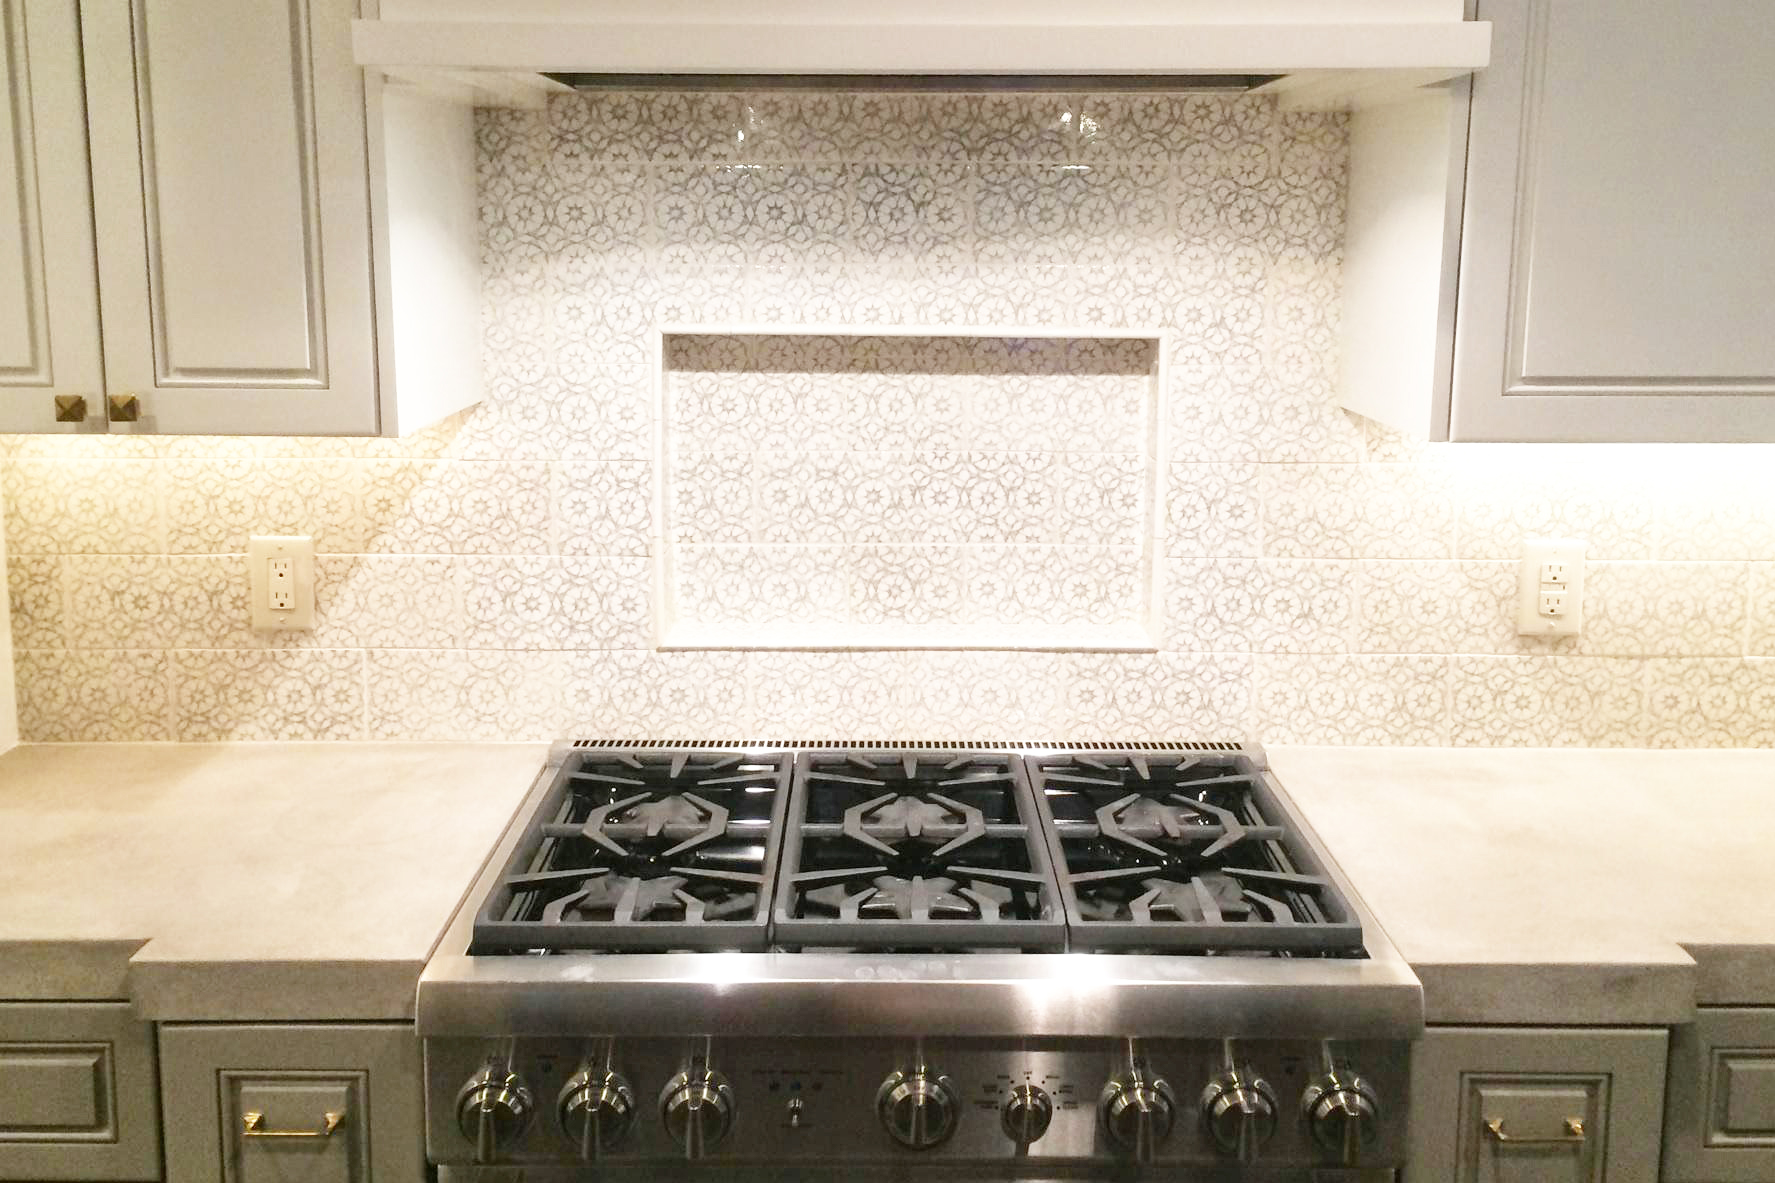 Pratt and Larson tiles on backsplash behind range in Houston Texas kitchen remodel by Jamie House Design. Concrete counters in kitchen.